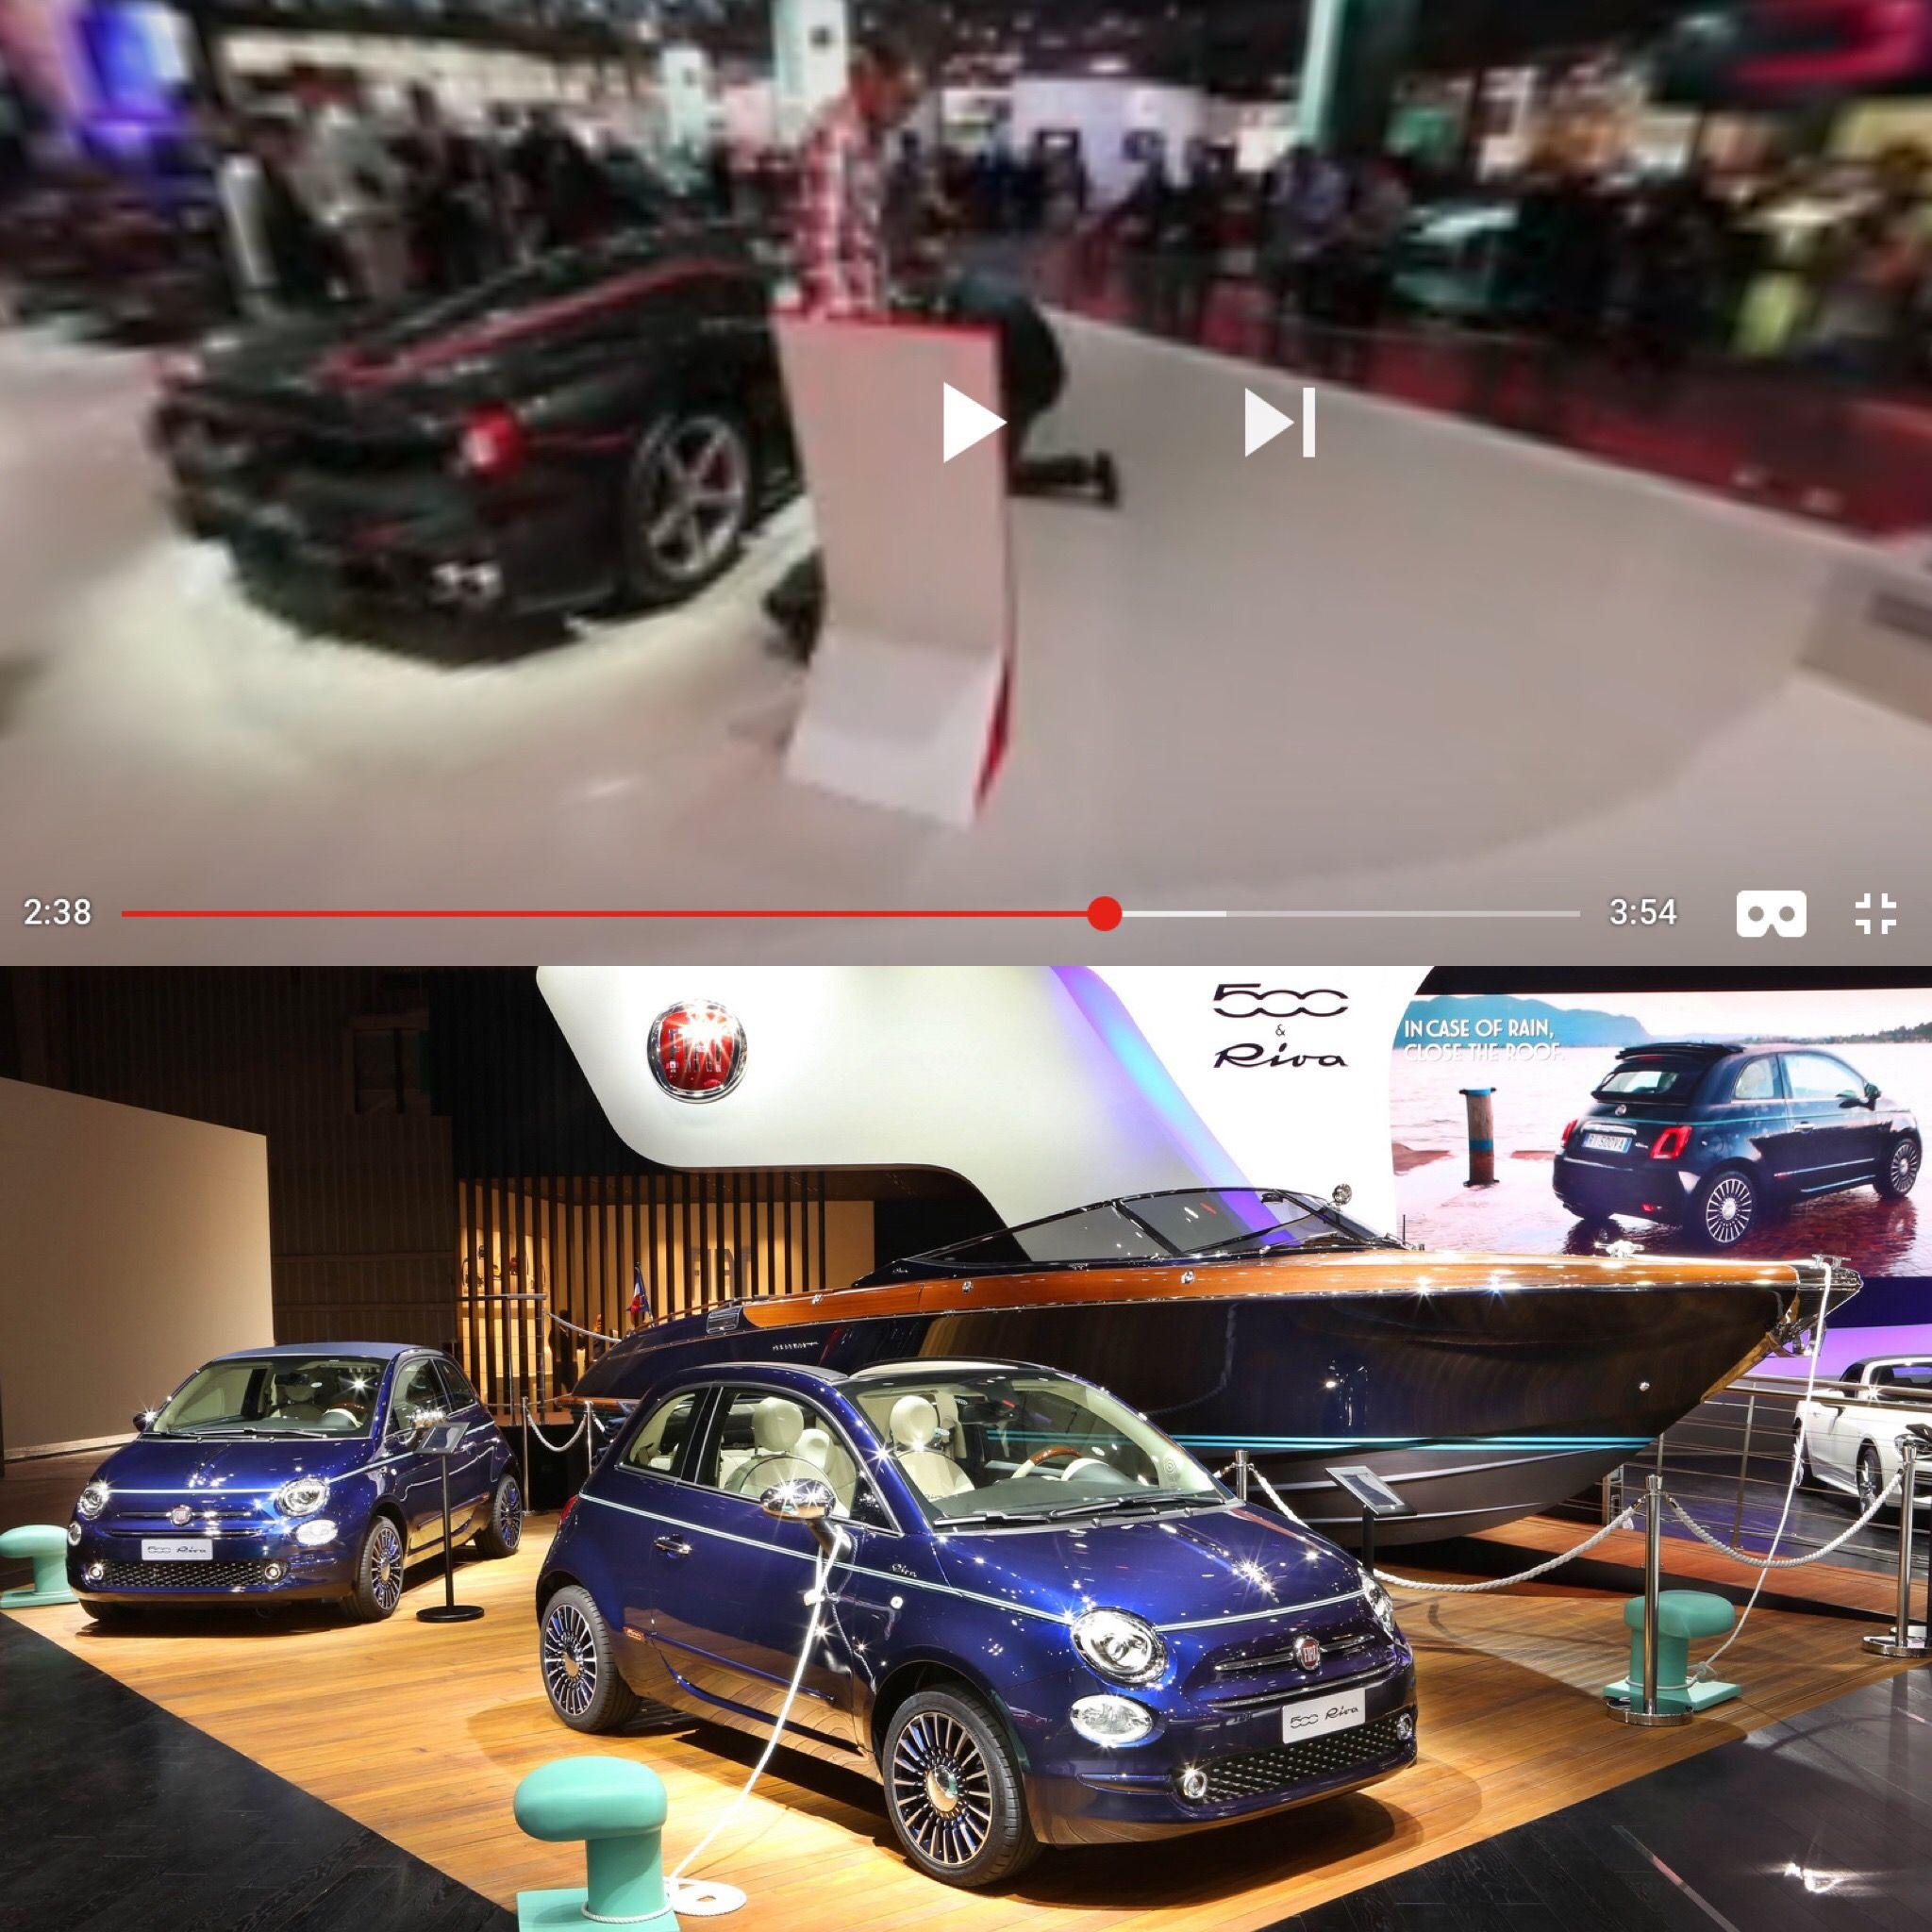 italian car news, today's featuring #fiat & #ferrari 🚗🇮🇹 http